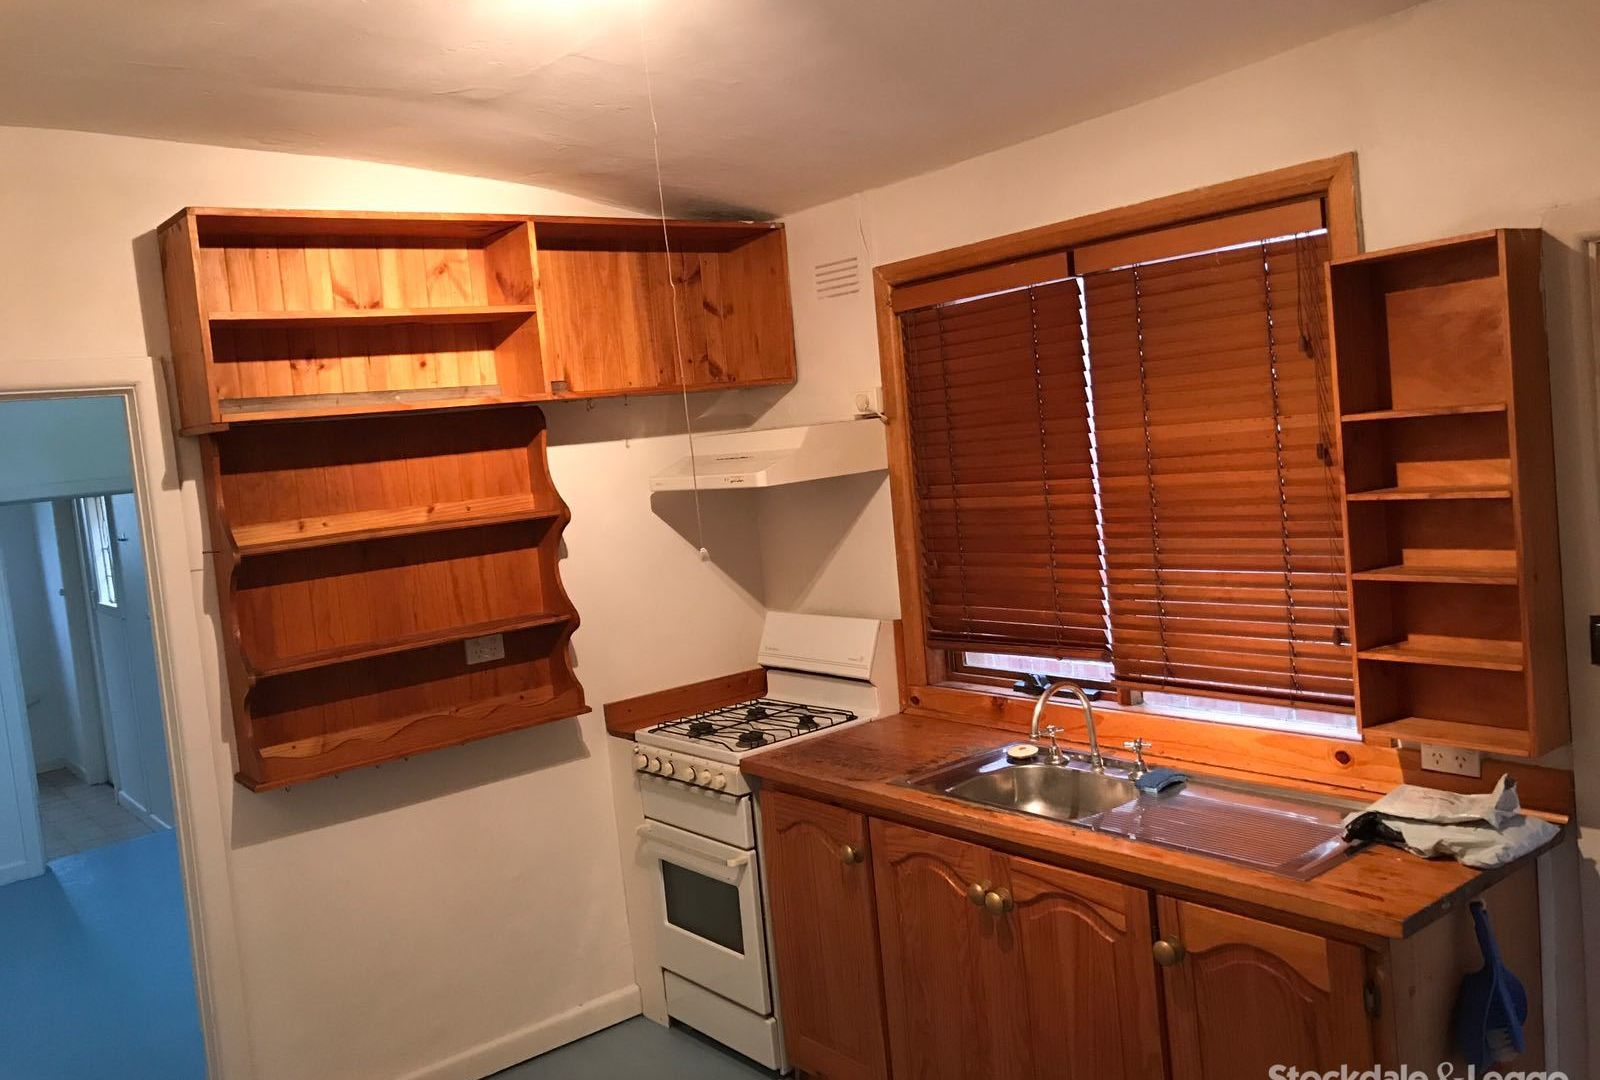 27 ALEXANDRA PARADE, Collingwood VIC 3066, Image 2